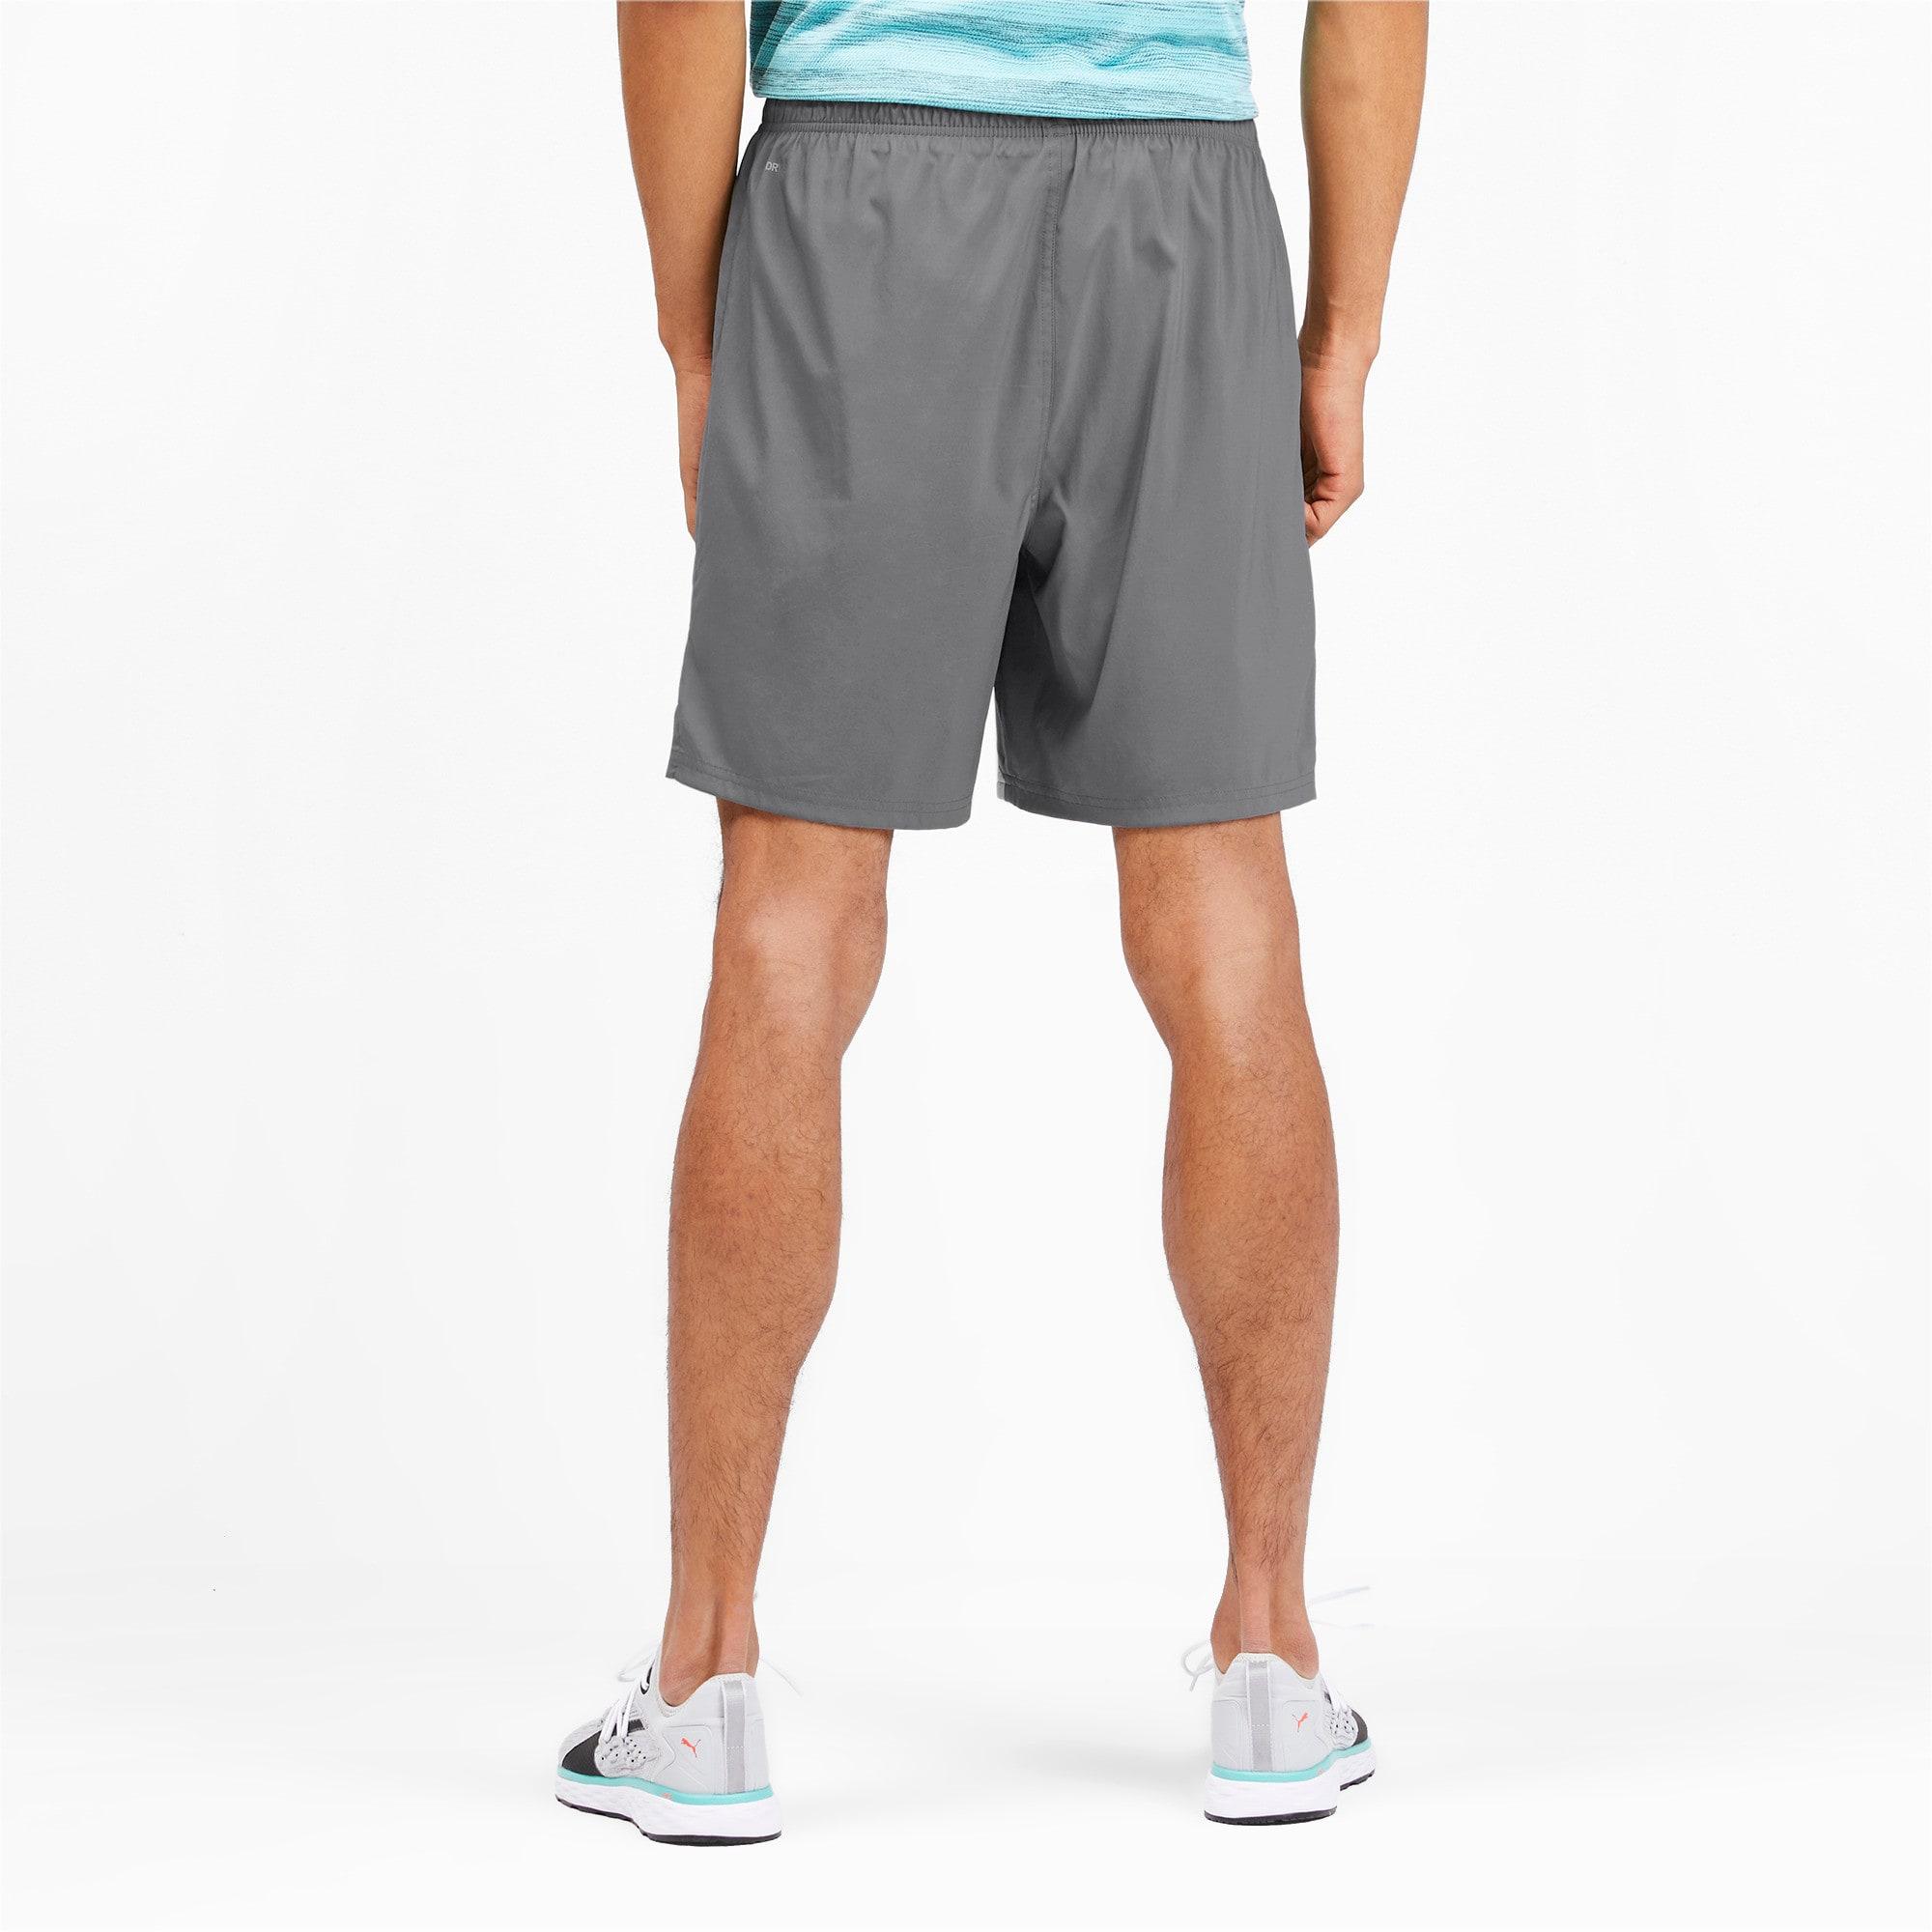 "Miniatura 2 de Shorts Ignite Blocked de 7"" para hombre, CASTLEROCK-Blue Turquoise, mediano"